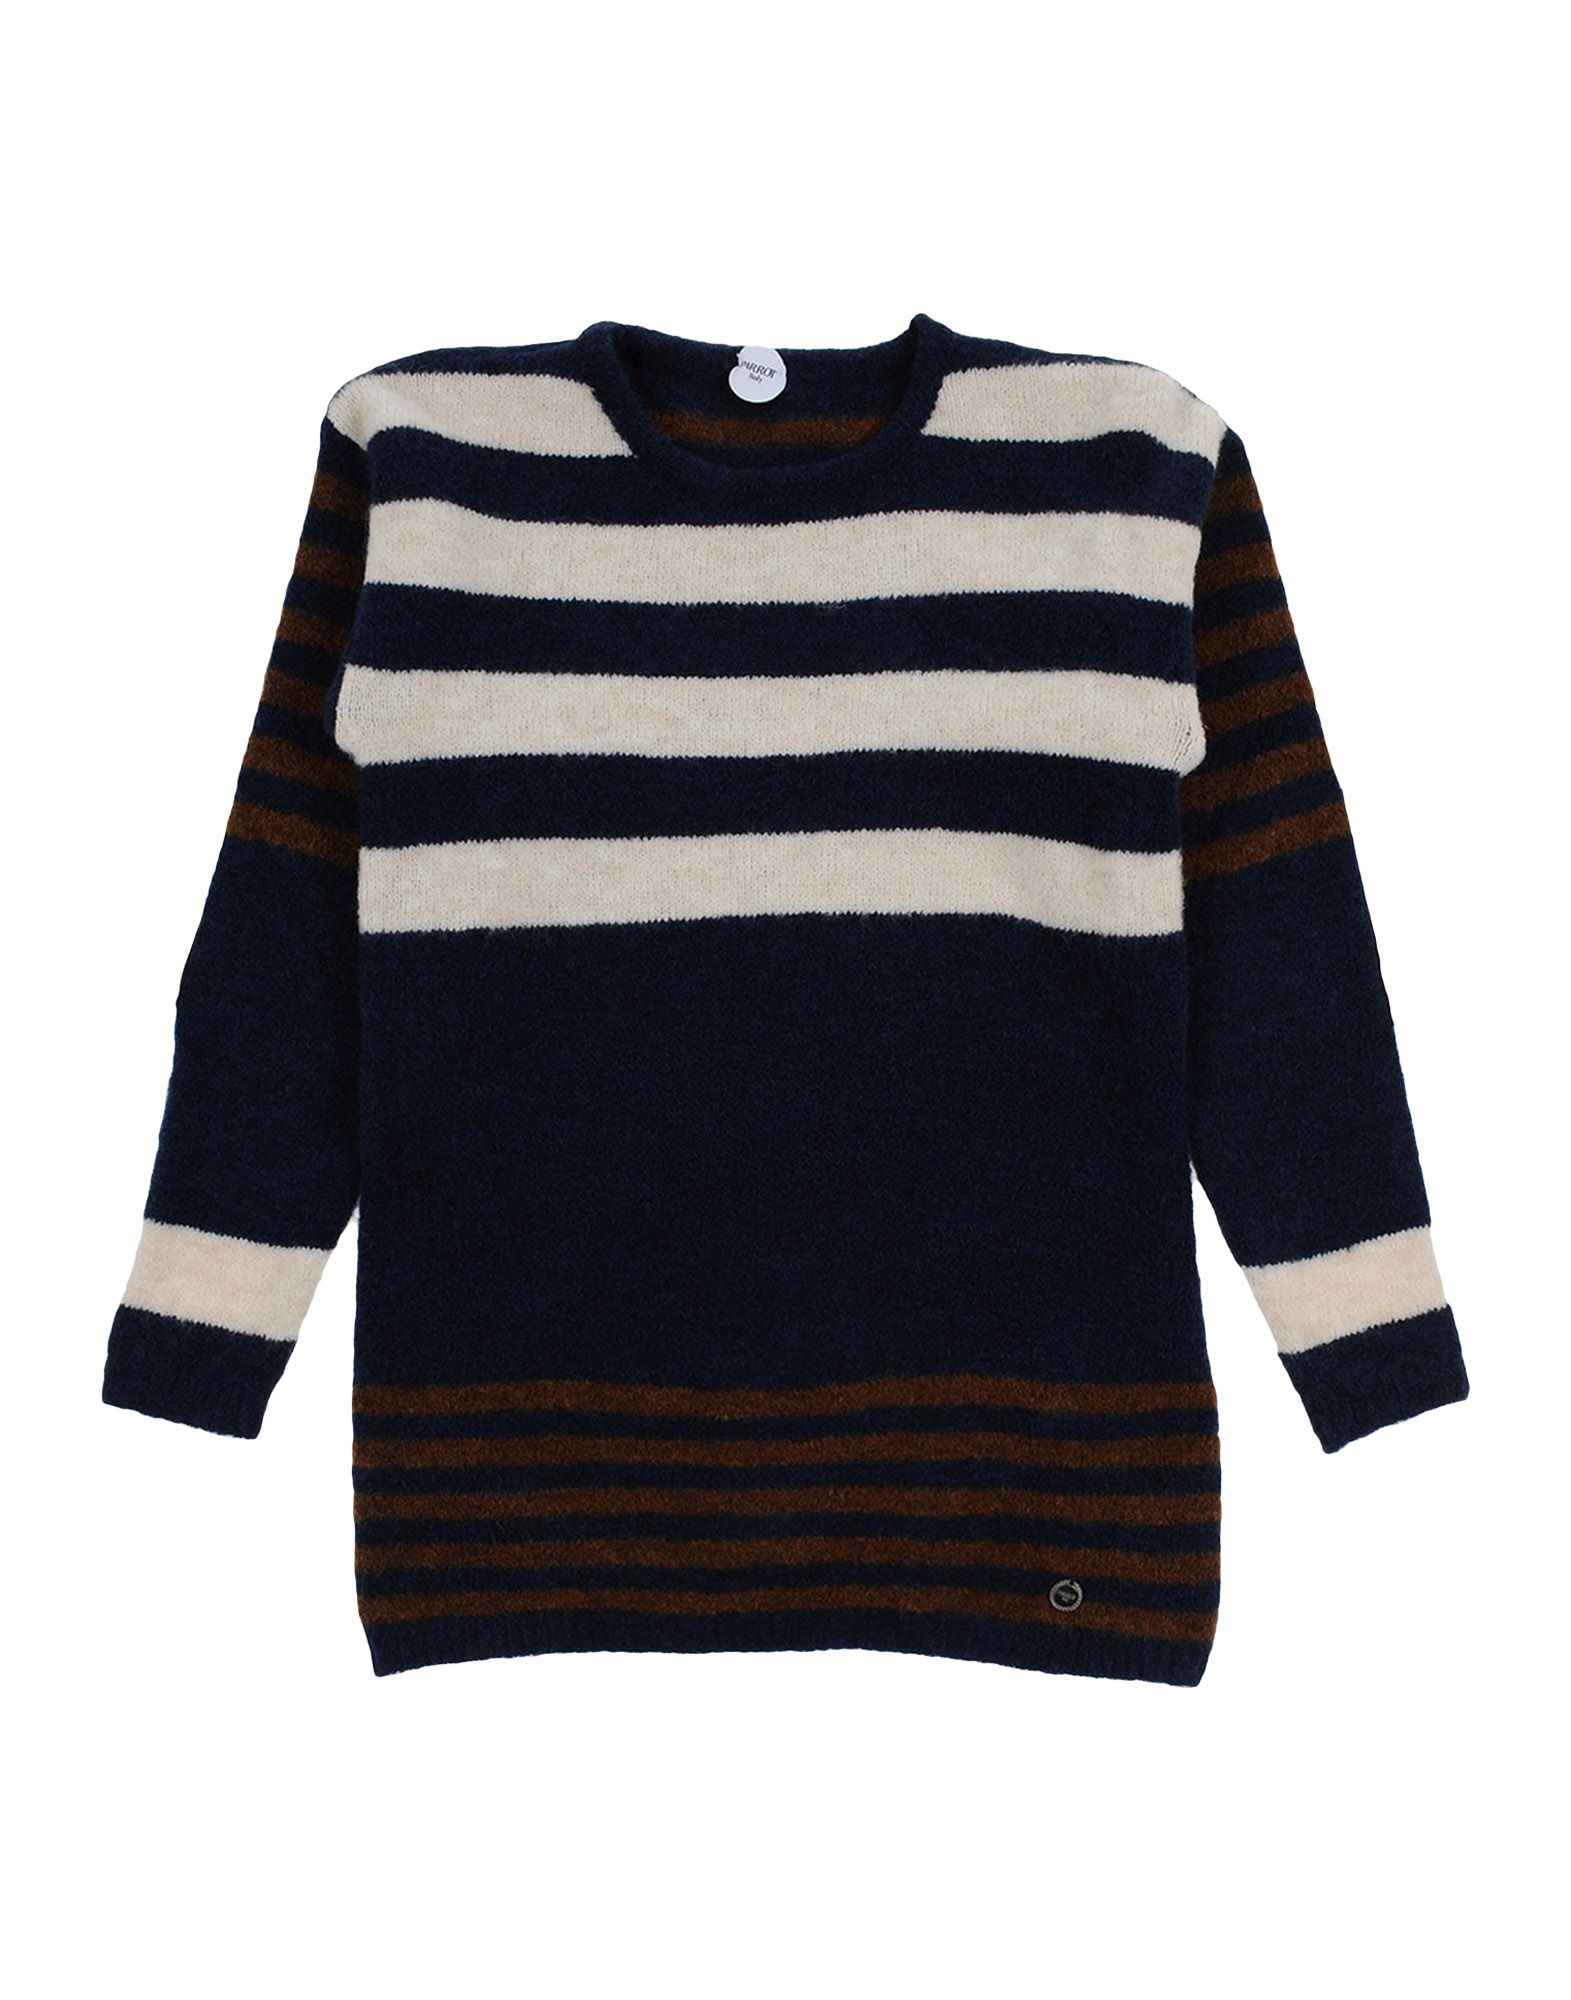 PARROT Sweater in Dark Blue